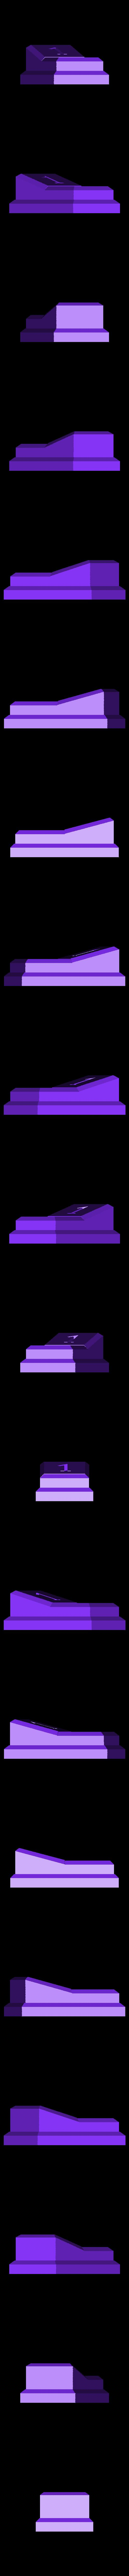 switch_x3.stl Download free STL file ORCA communicator (Godzilla) • 3D printing object, poblocki1982